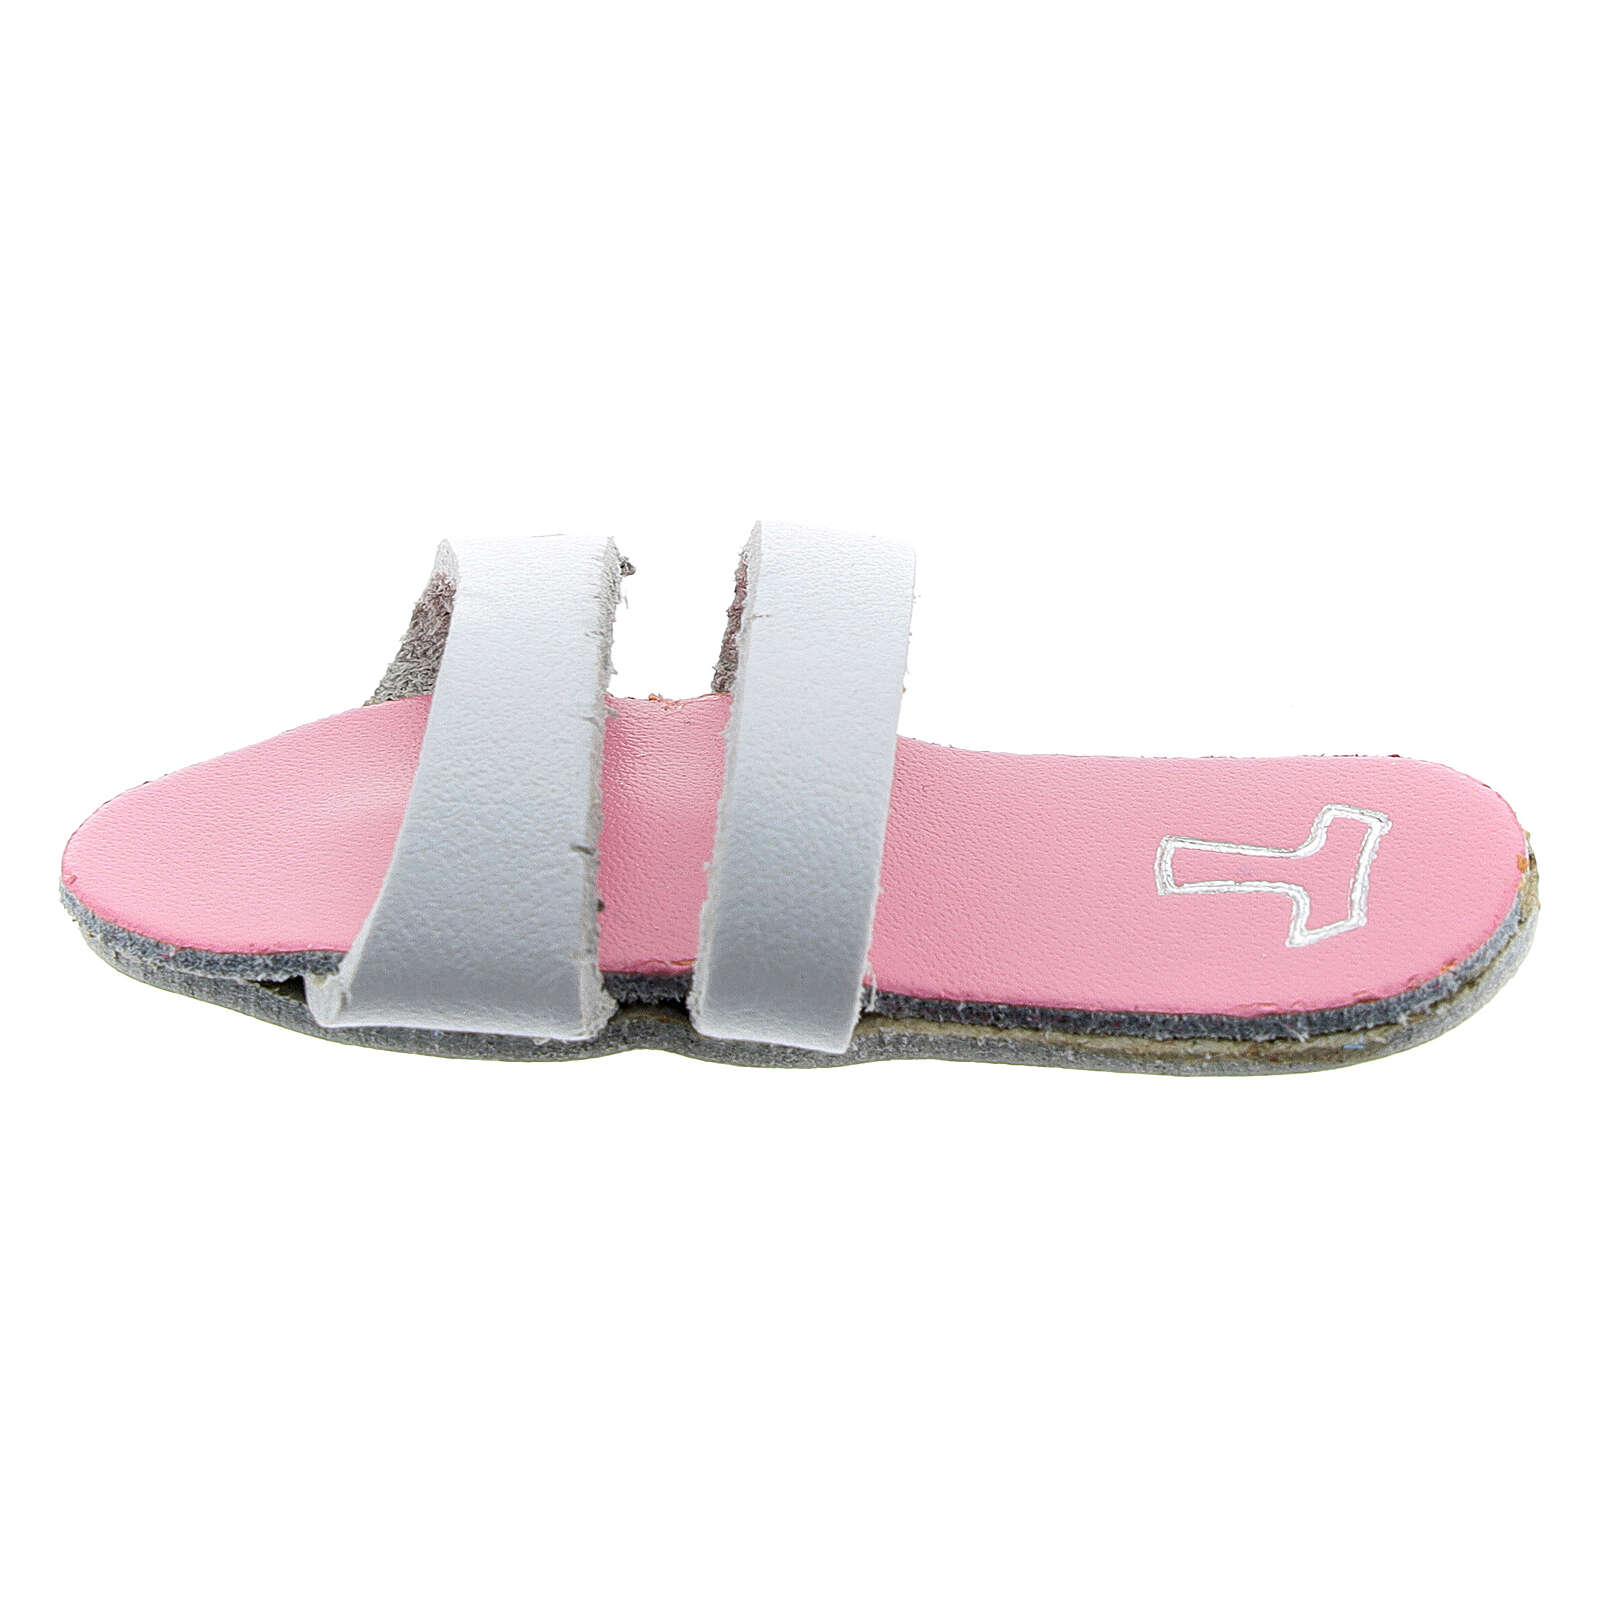 Aimant sandale franciscaine semelle rose Tau 6 cm cuir véritable 3